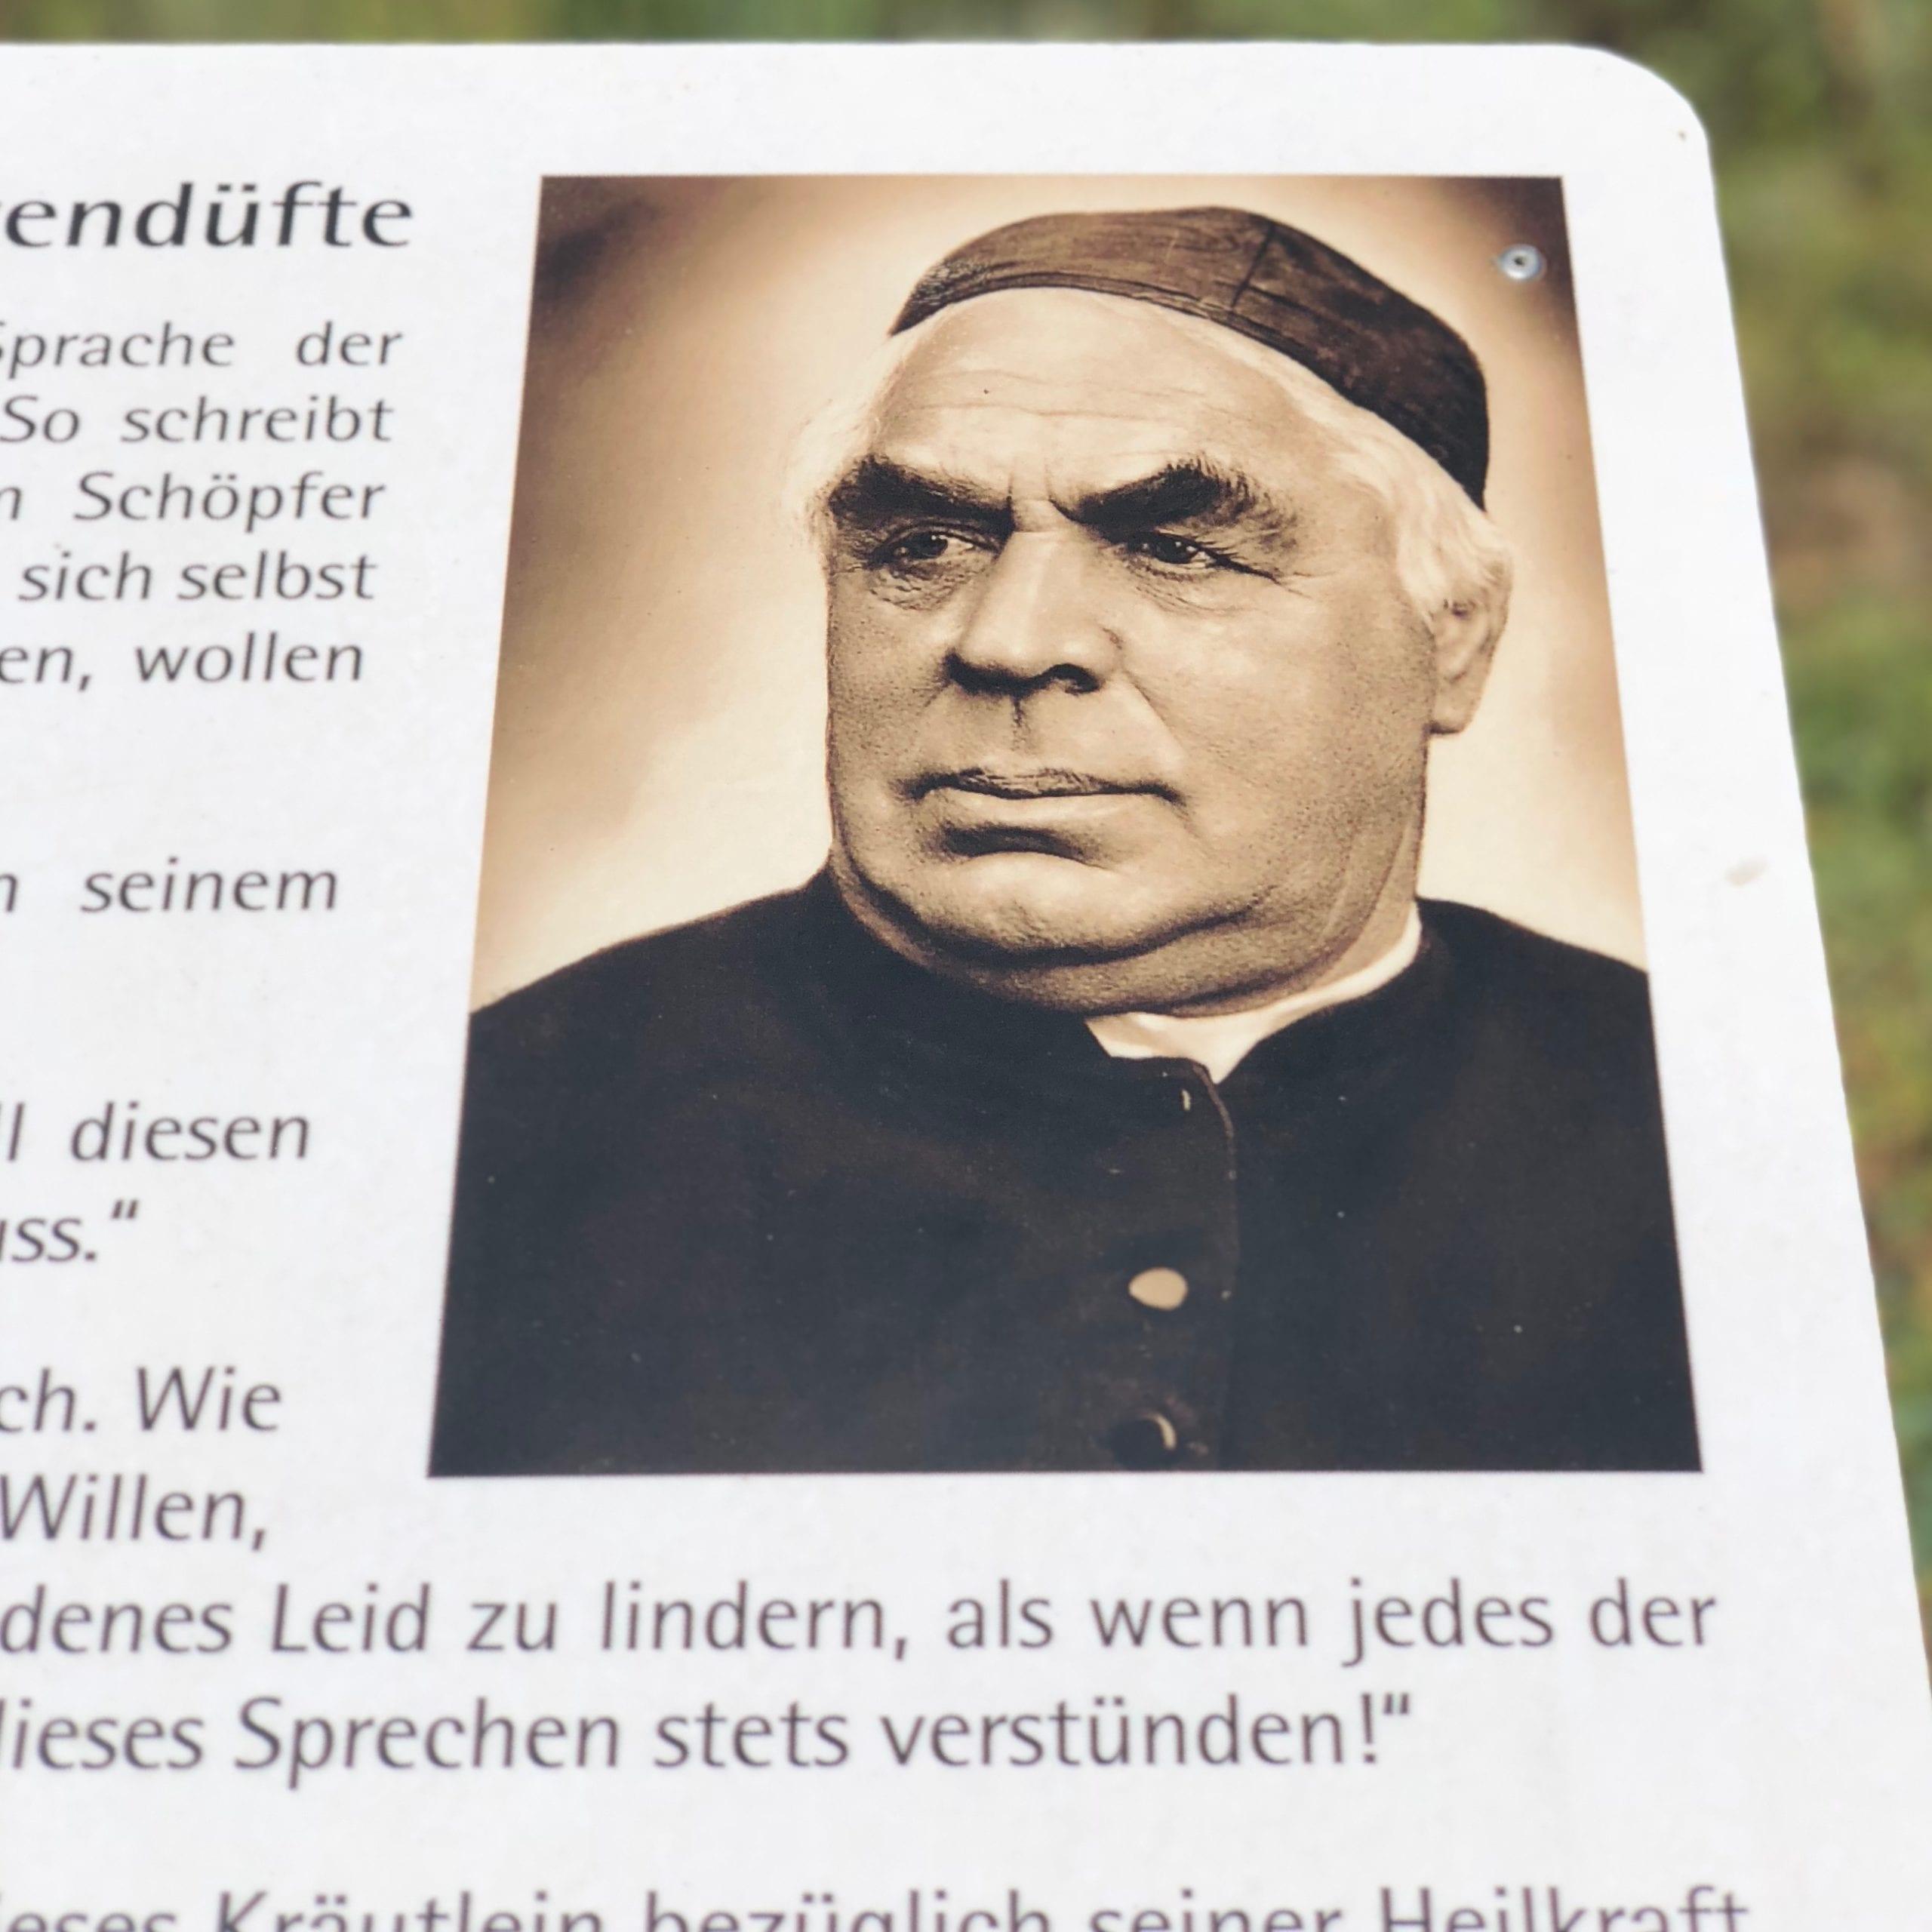 Kneipp - Pfarrer Sebastian Kneipp